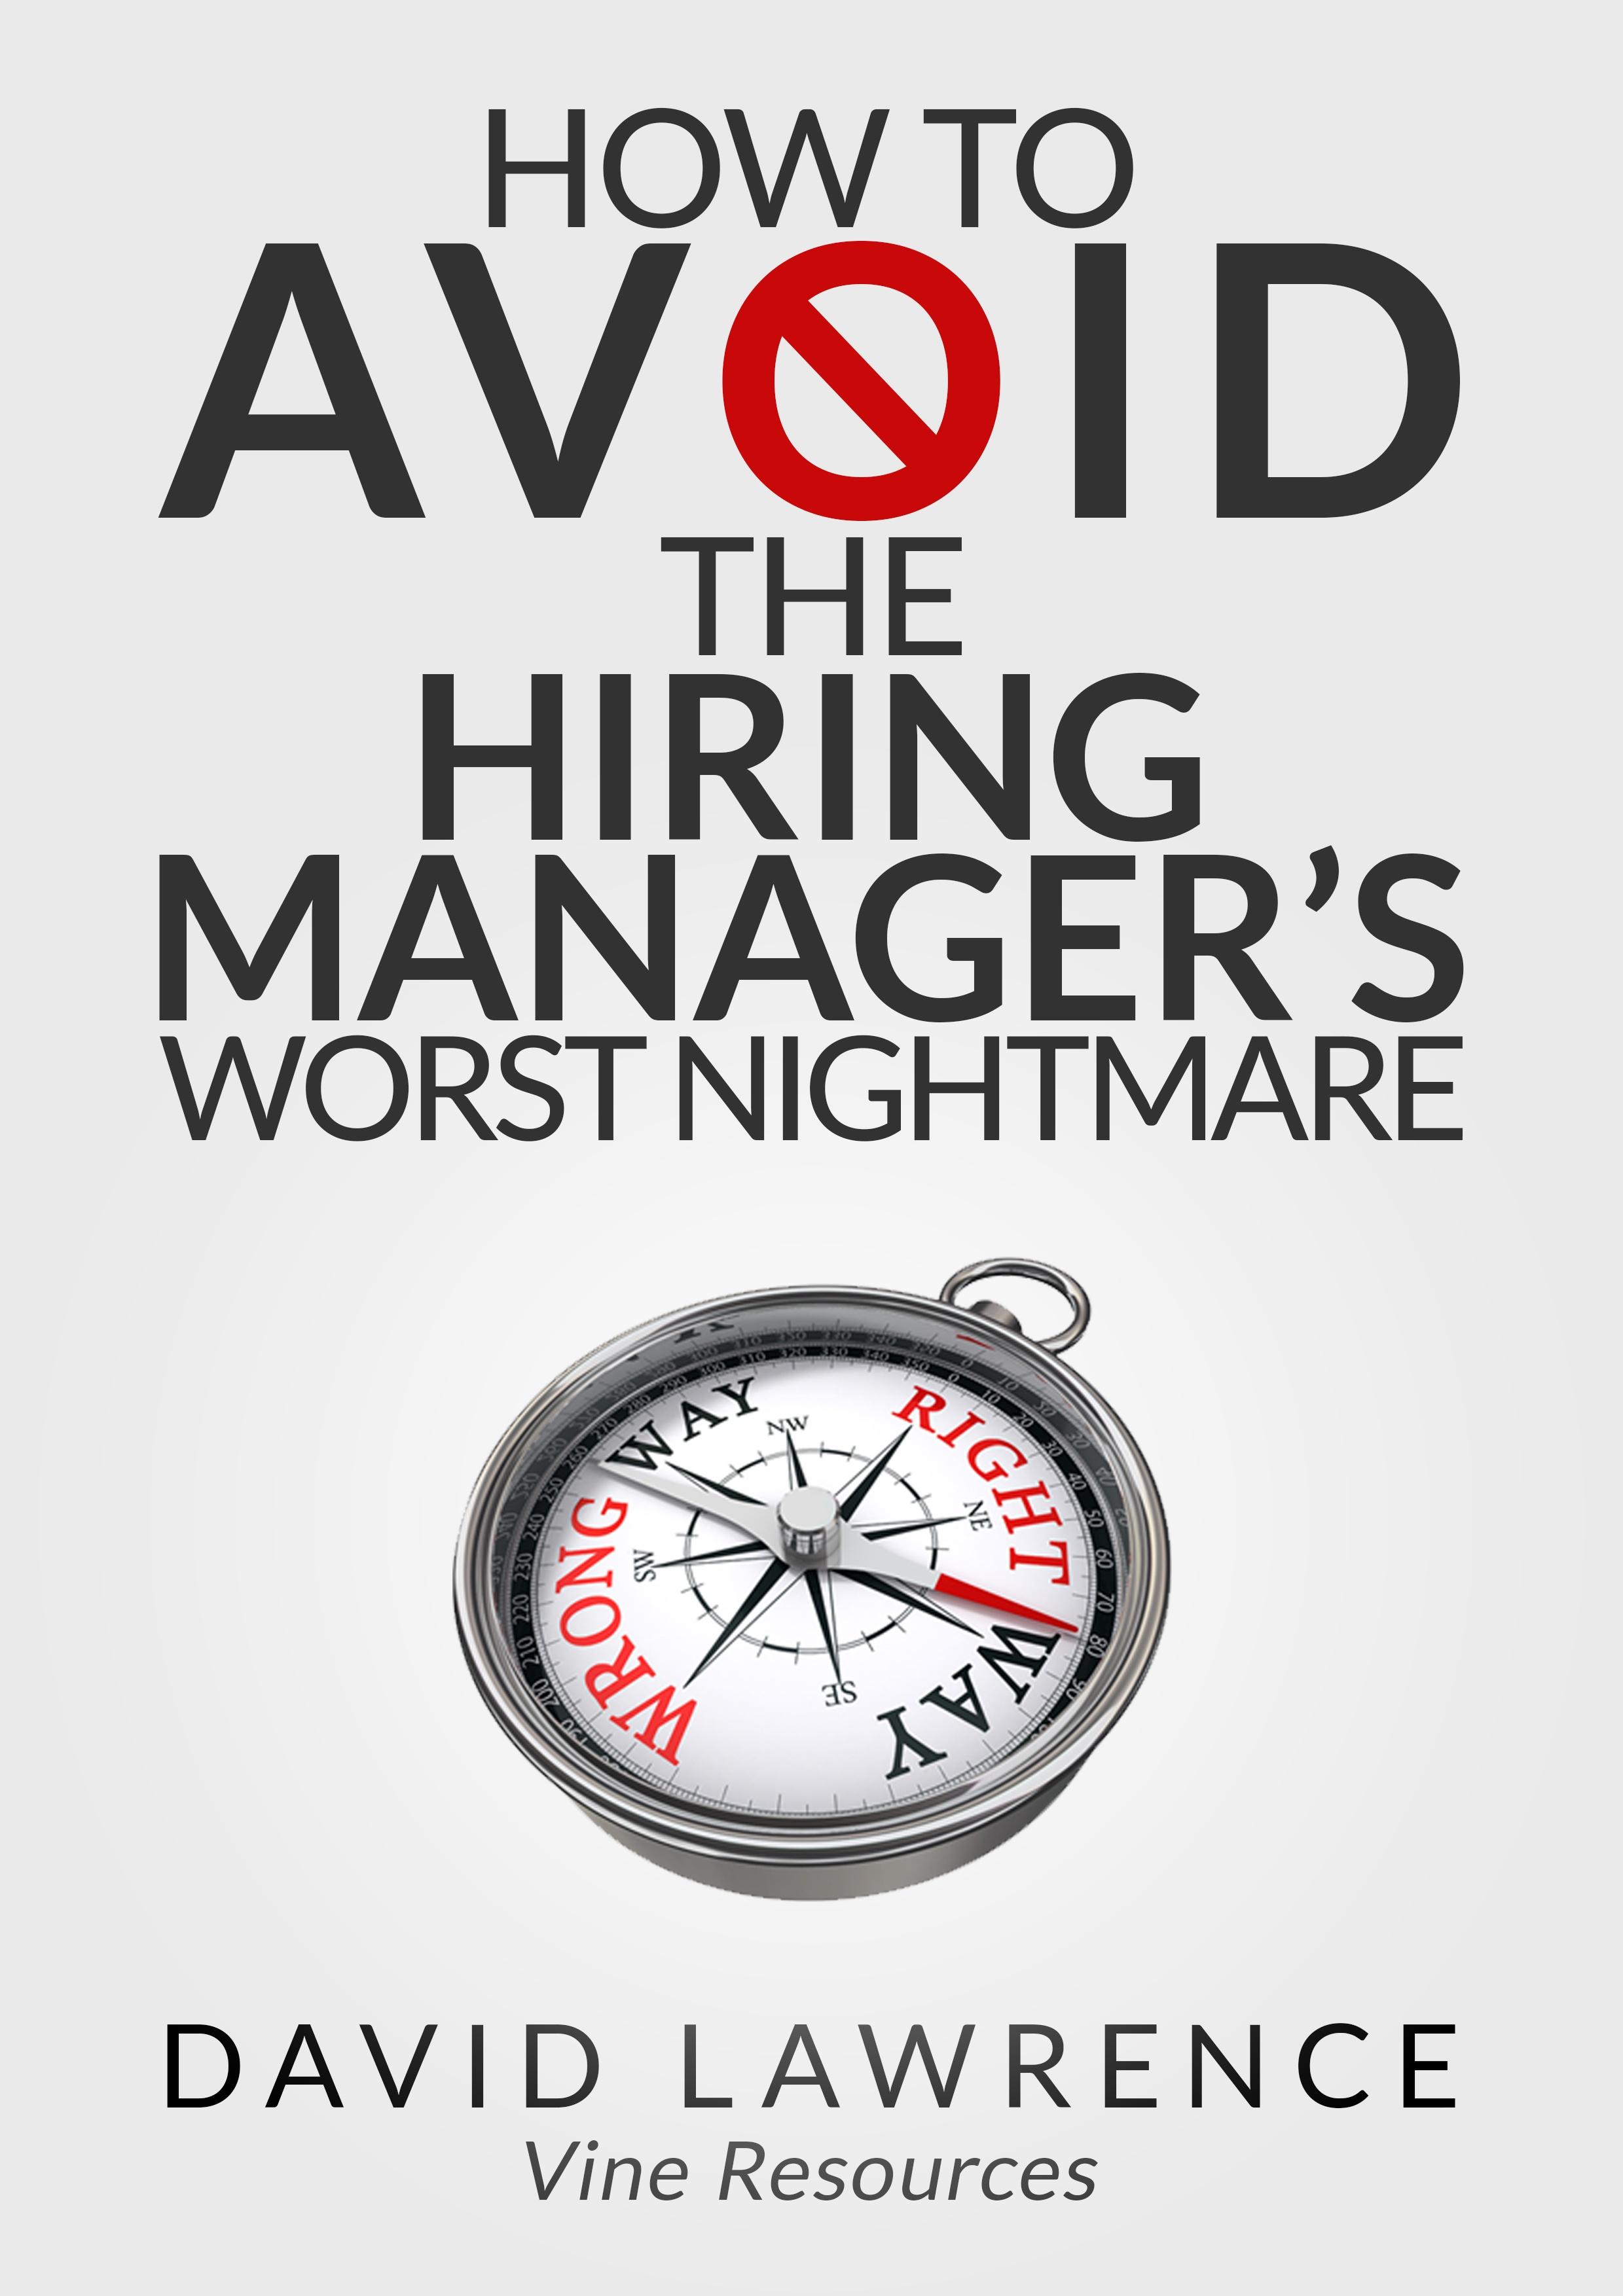 David-How_to_avoid_hiring_manager.jpg